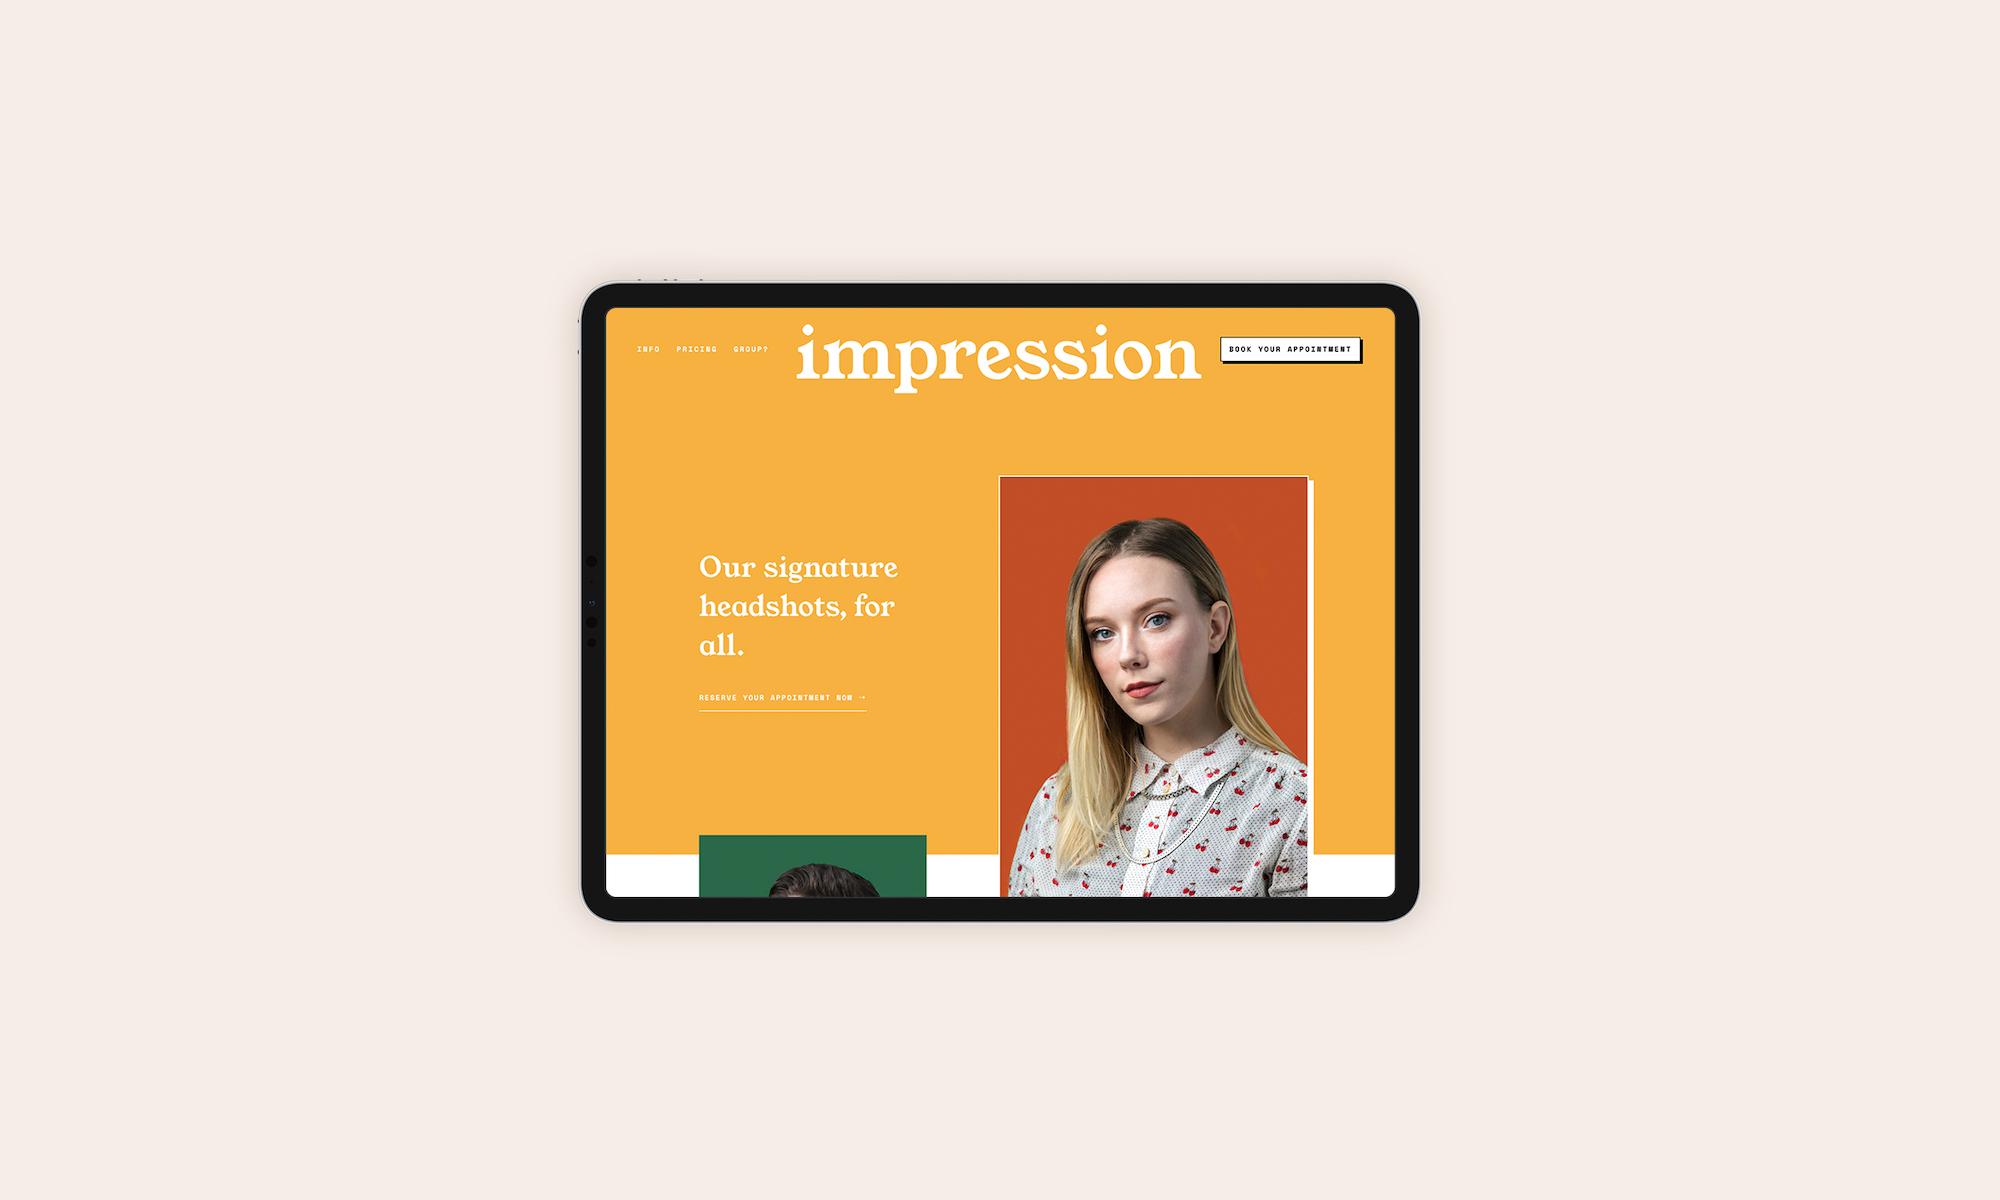 impression — design and development